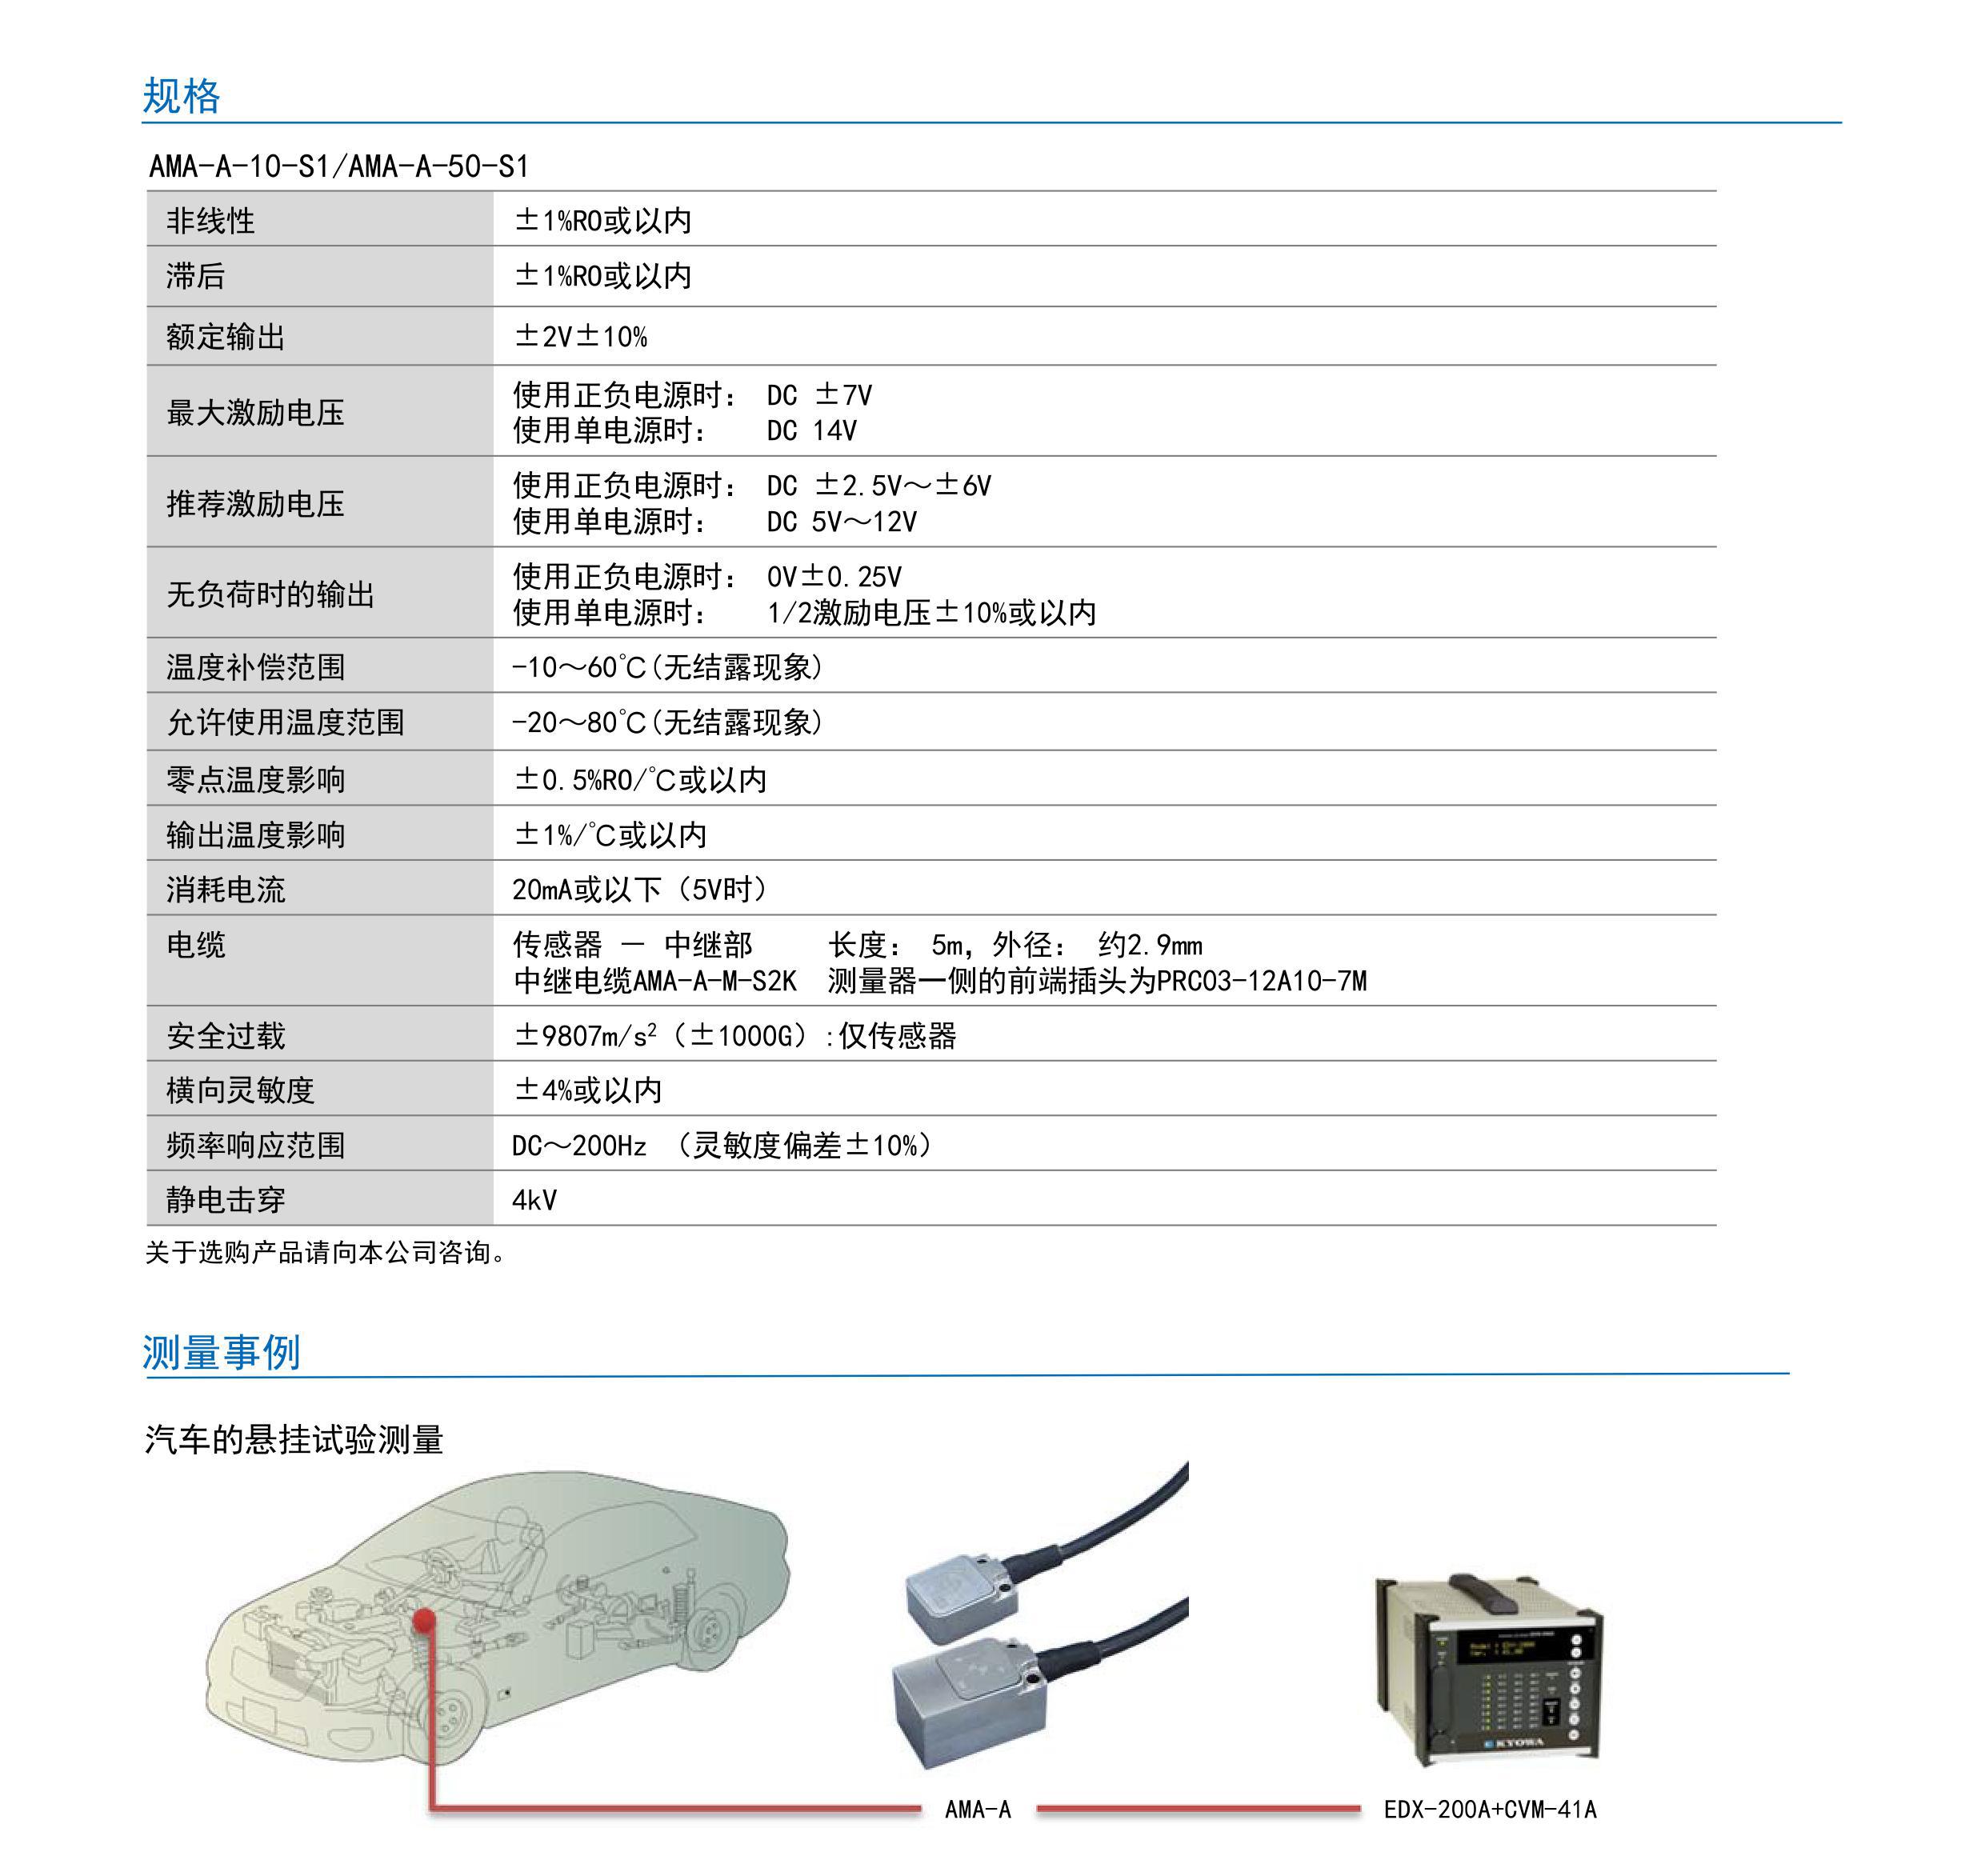 AMA-A-10-S1/50-S1技术参数表